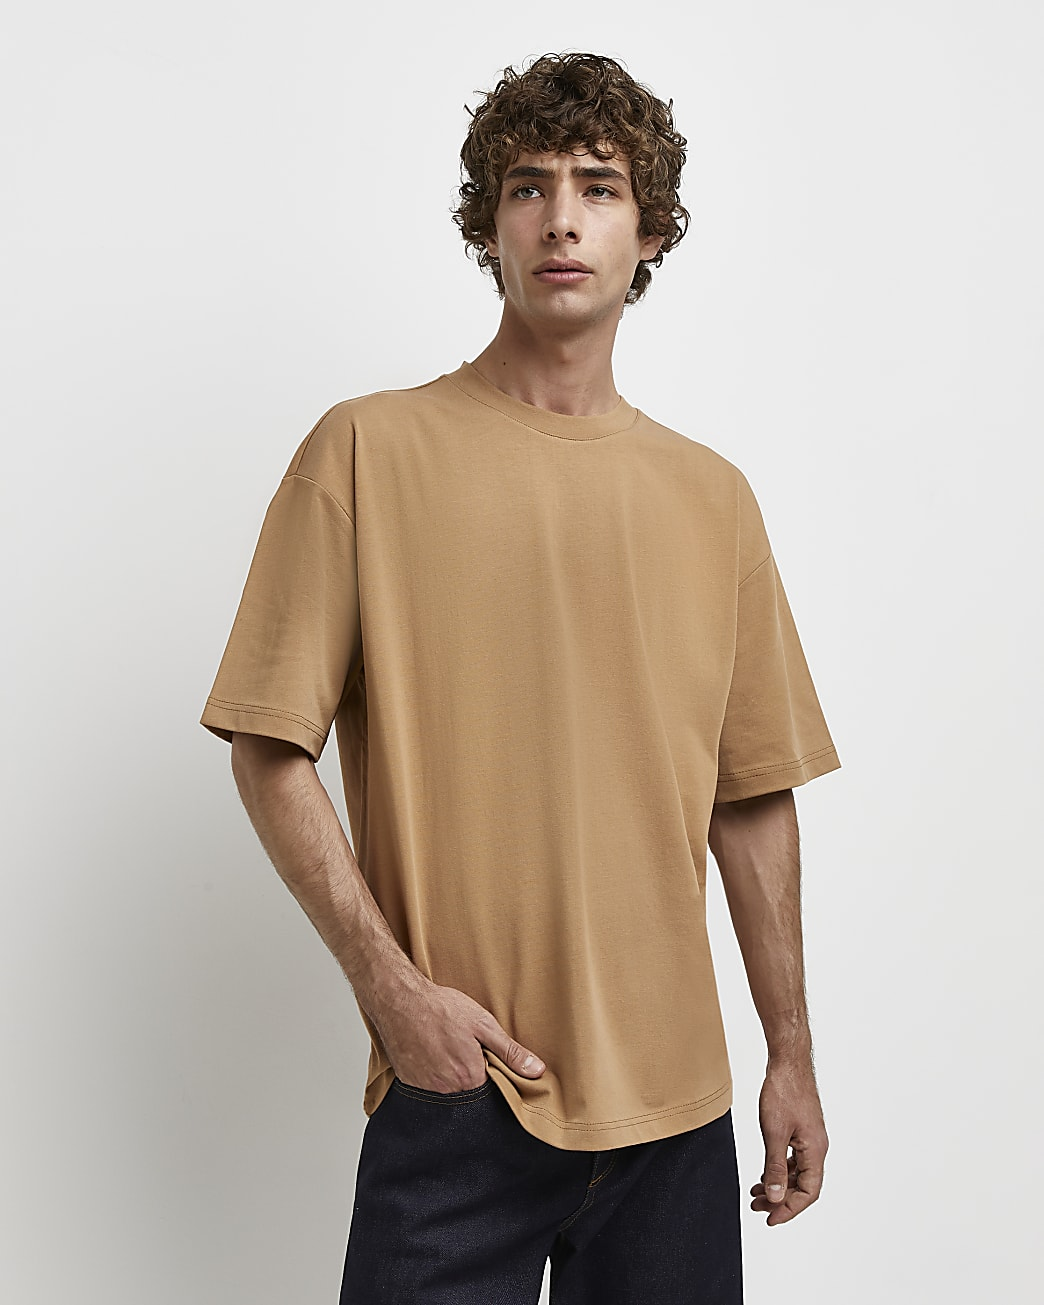 Brown RI Studio oversized fit t-shirt